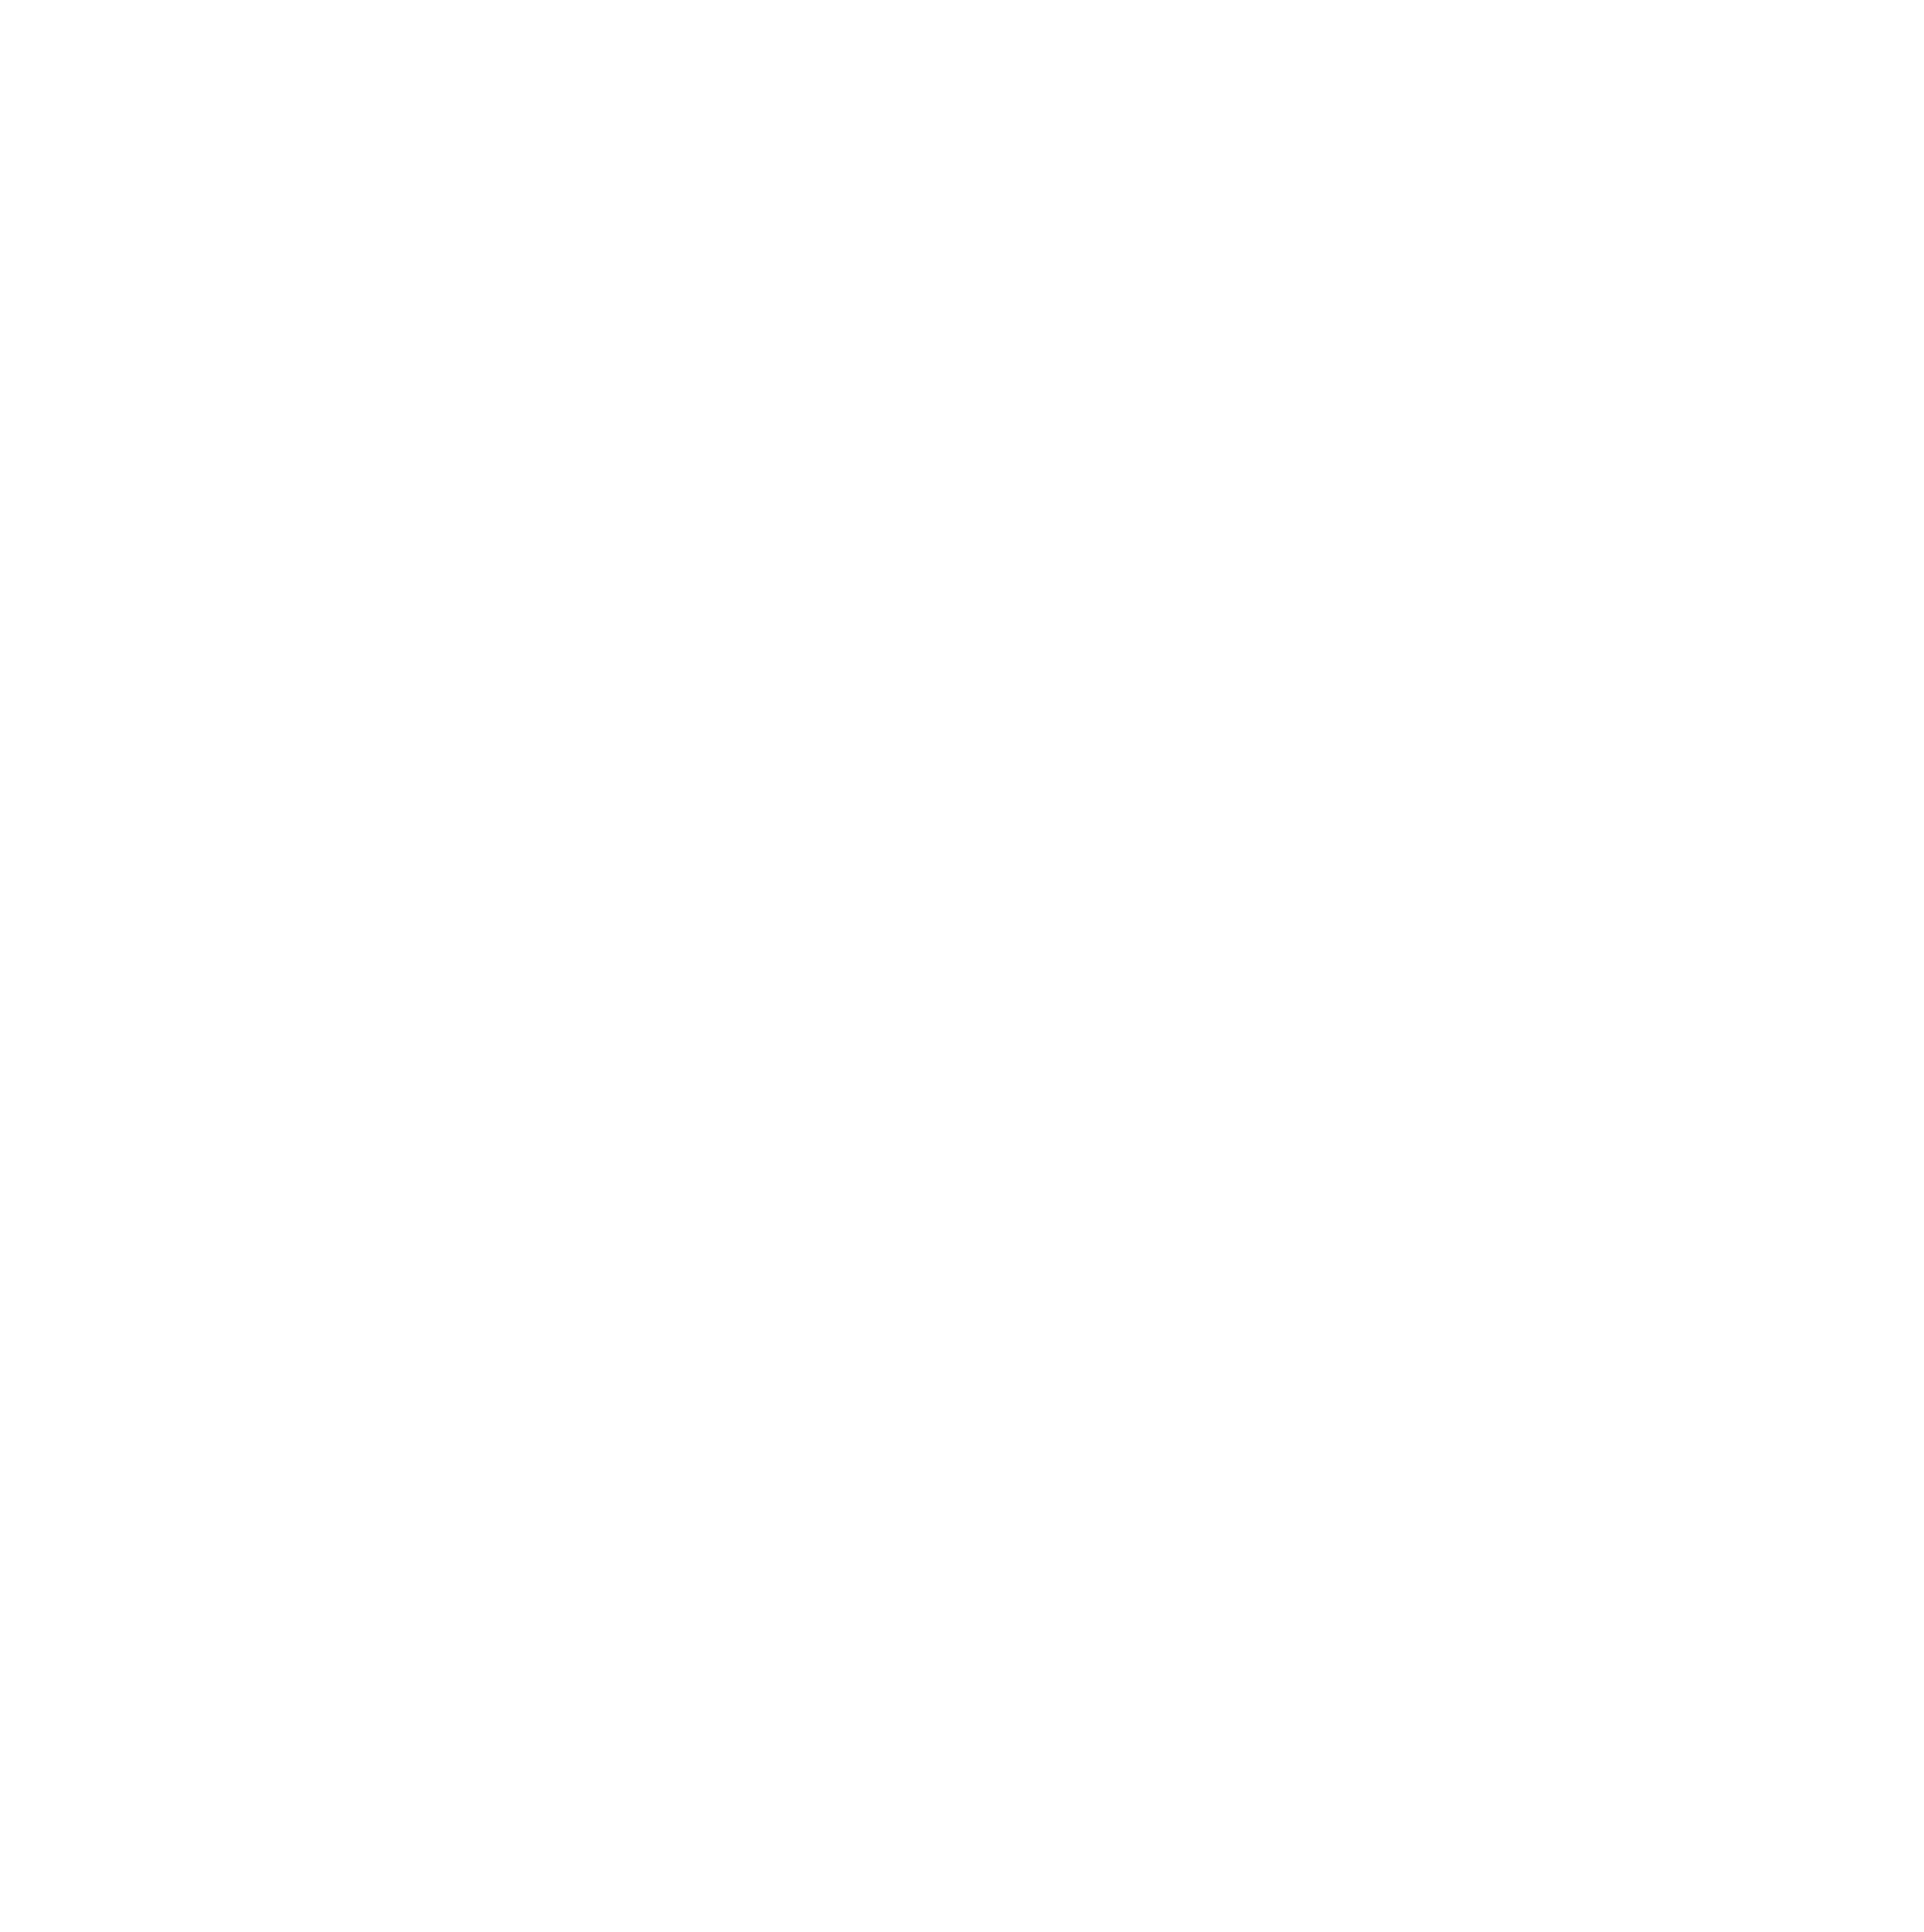 RC Apartmentos